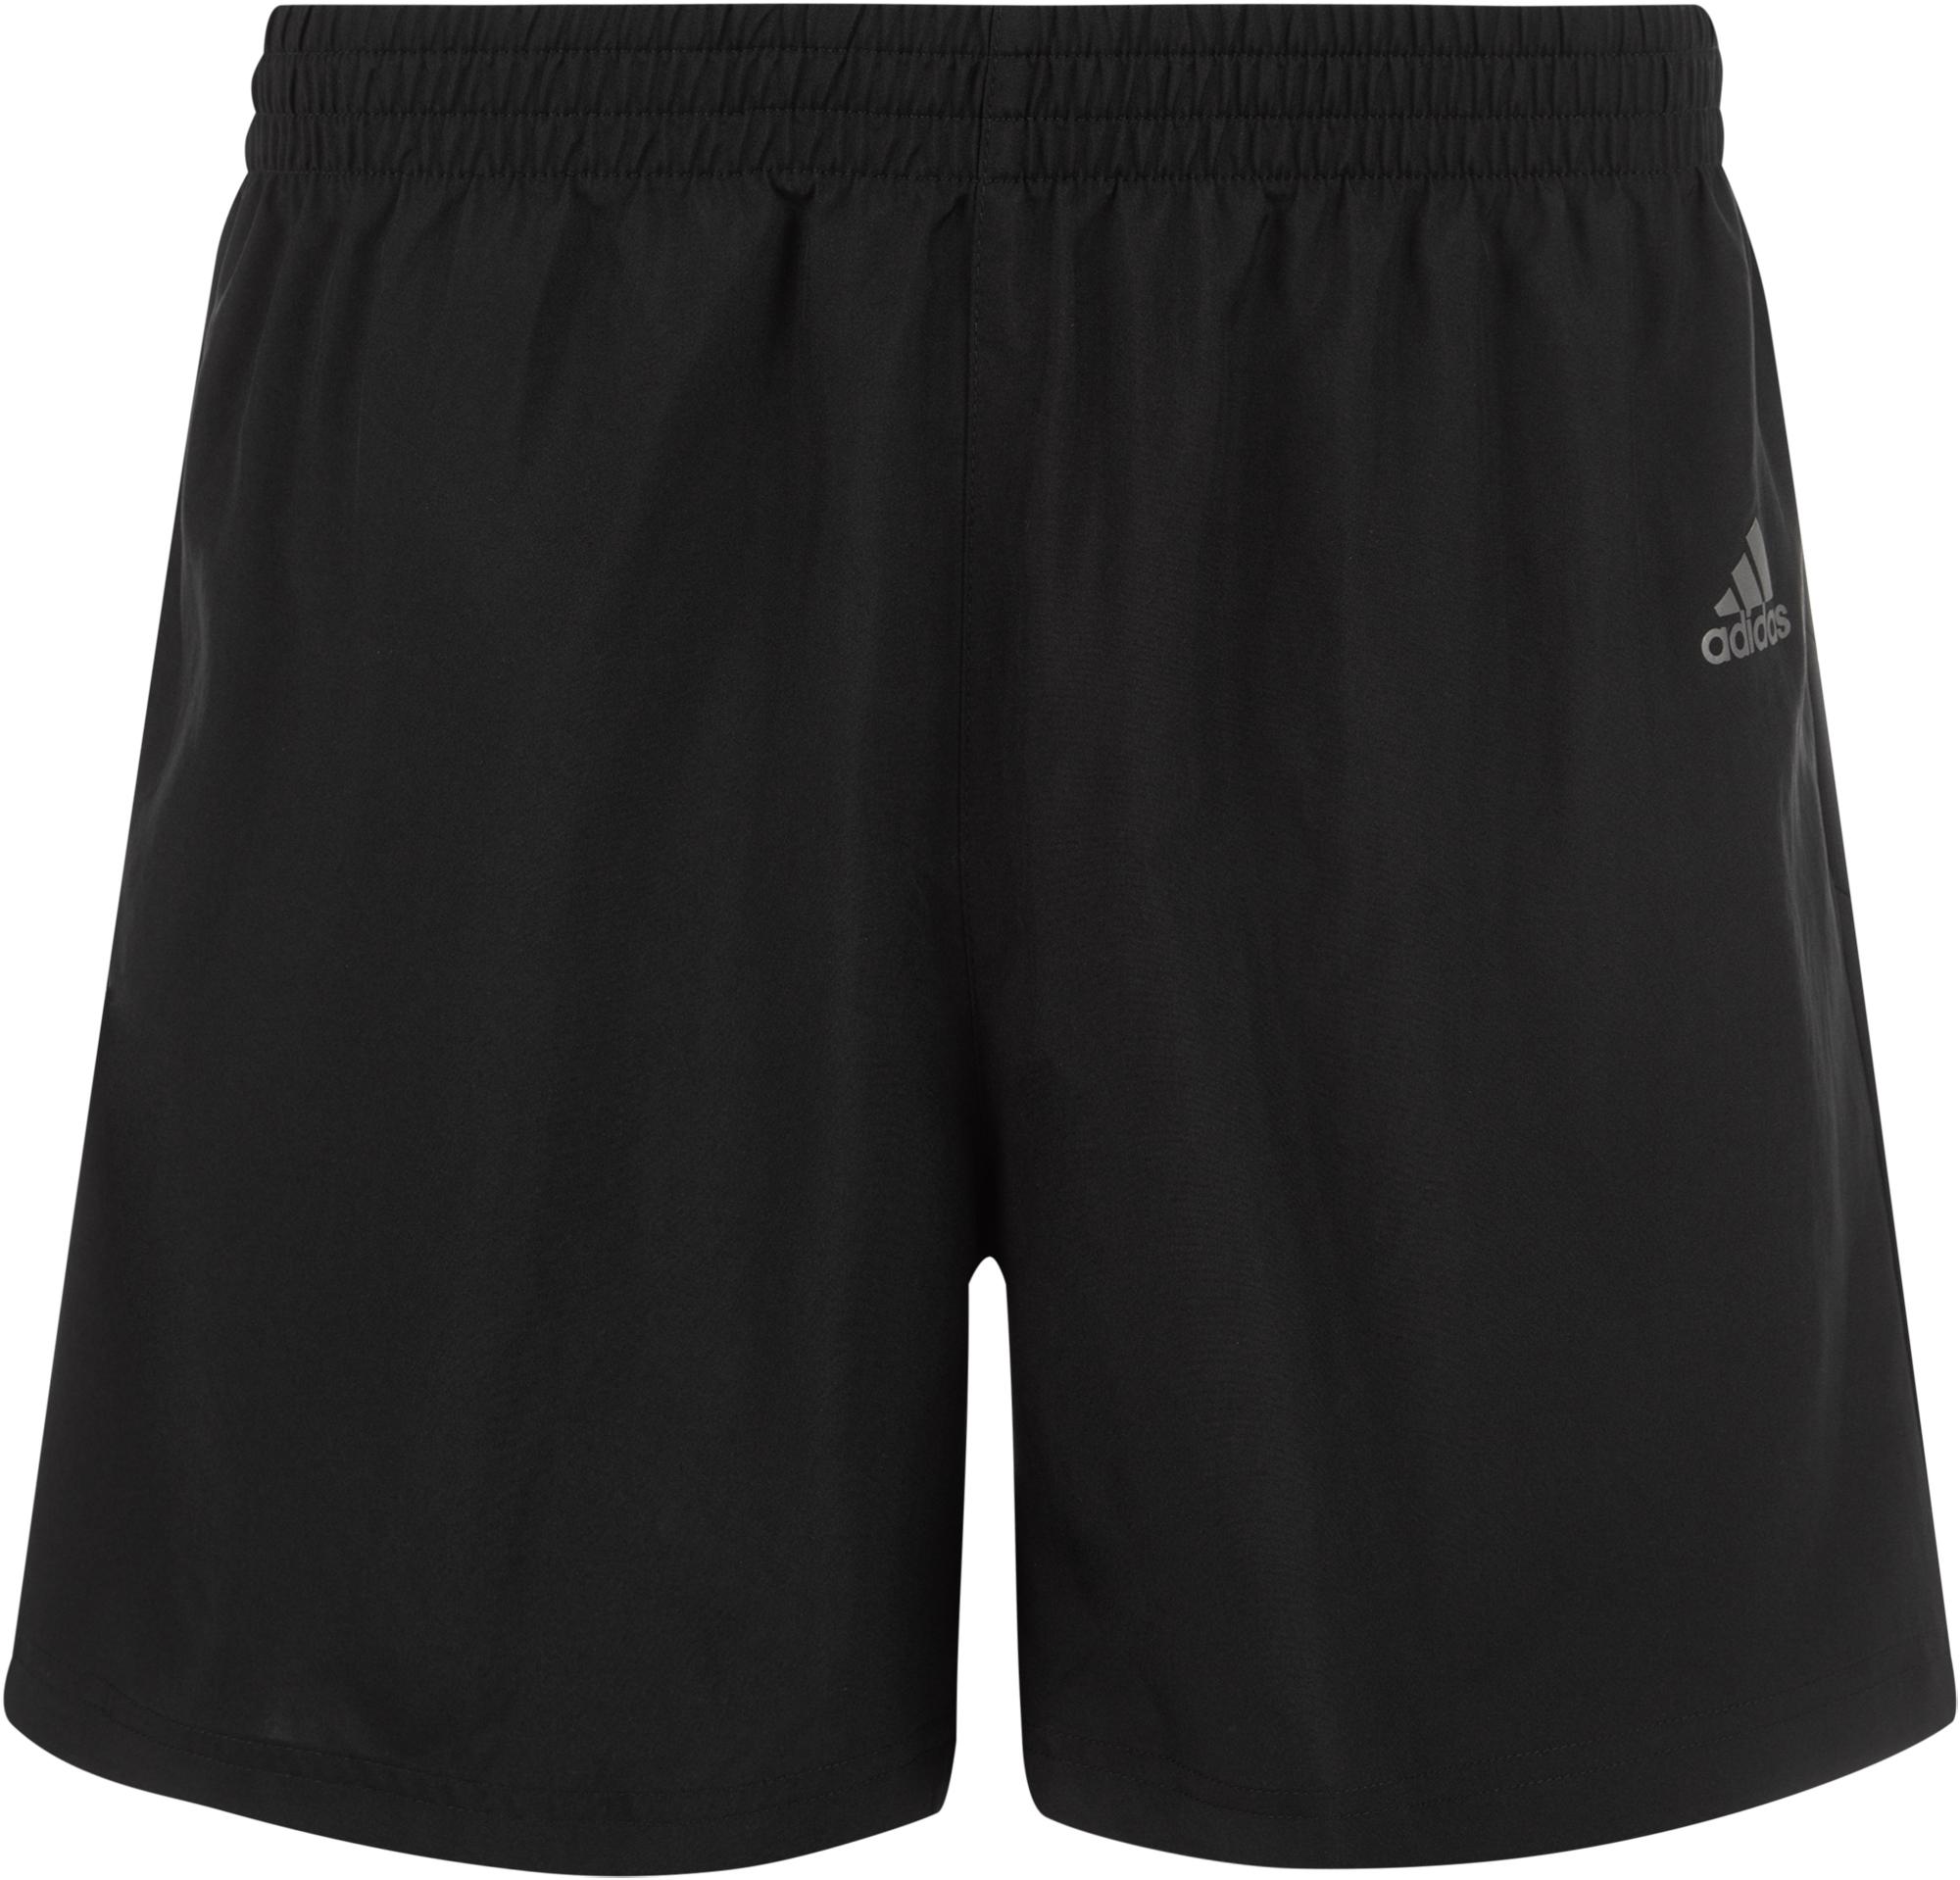 Adidas Шорты мужские adidas Own the Run, размер 56-58 шорты для тенниса мужские adidas uncontrol climachill цвет черный b45842 размер l 52 54